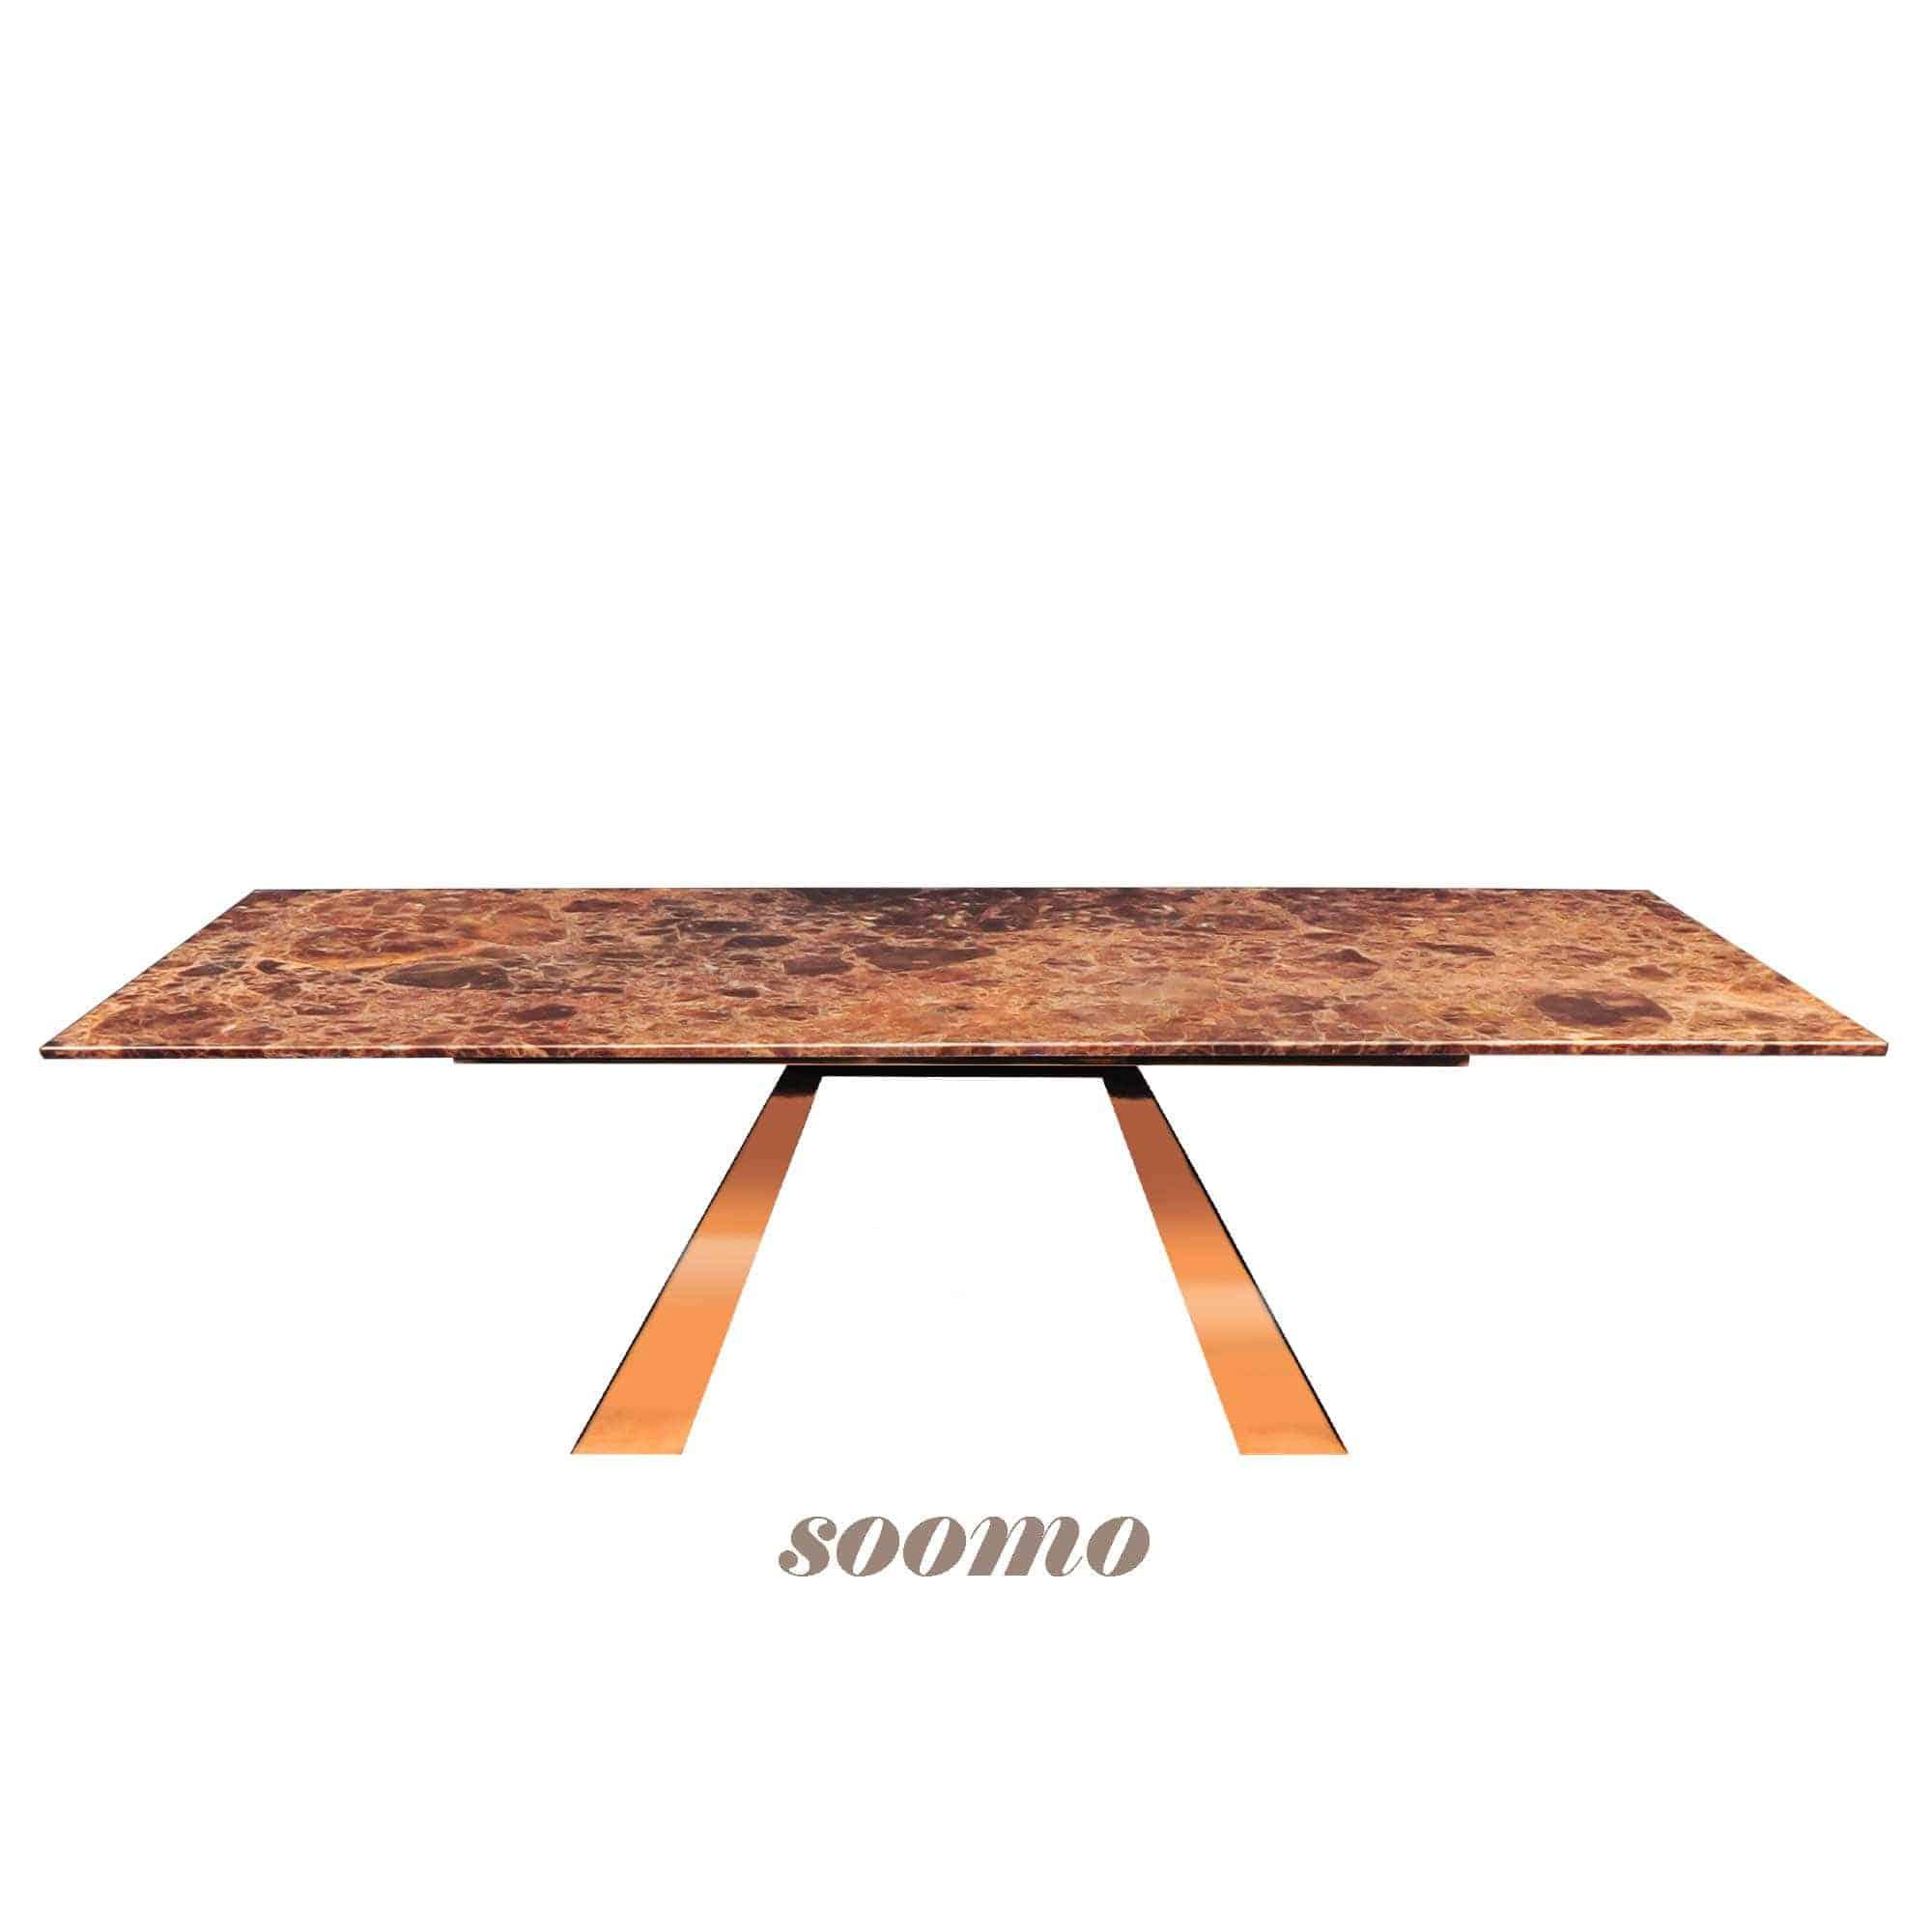 dark-emperador-dark-brown-rectangular-marble-dining-table-6-to-8-pax-decasa-marble-2100x1000mm-soomo-rg